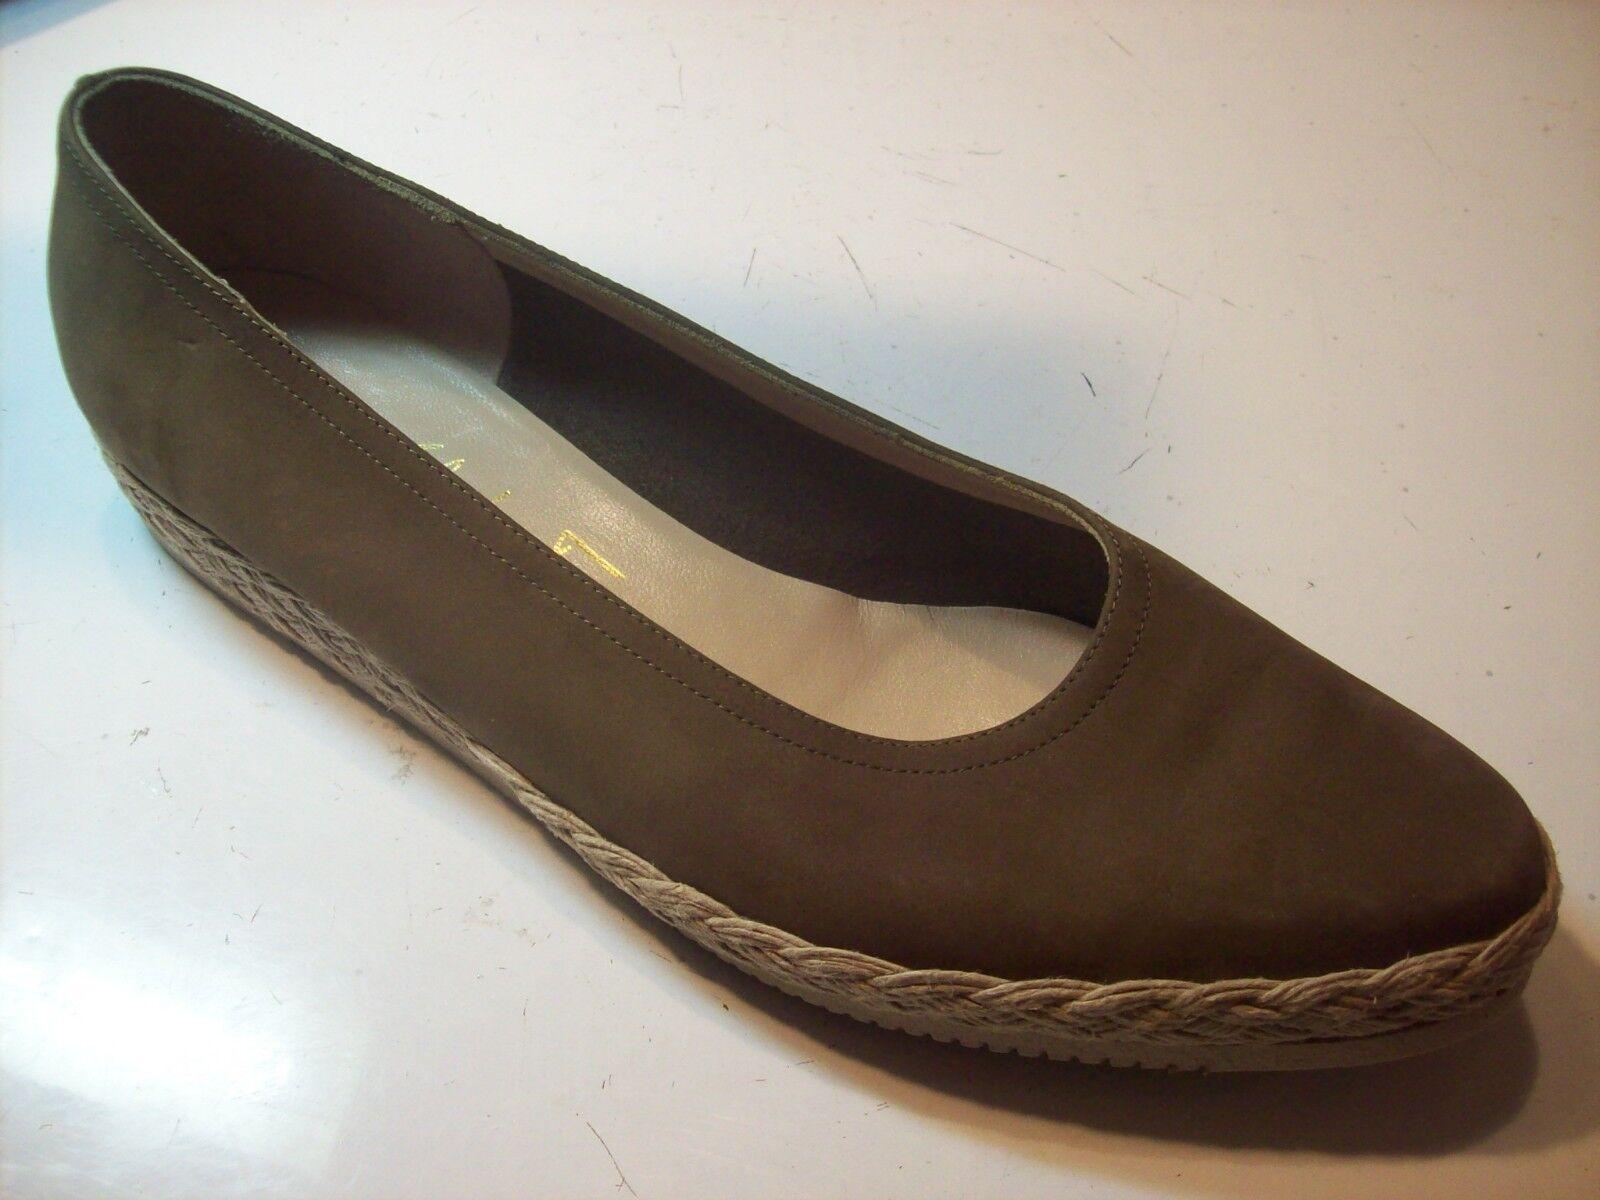 Salvatore Espadrille Ferragamo Taupe Green Brown Espadrille Salvatore Pumps Flats Shoe Size 10 cLOSeT 127360